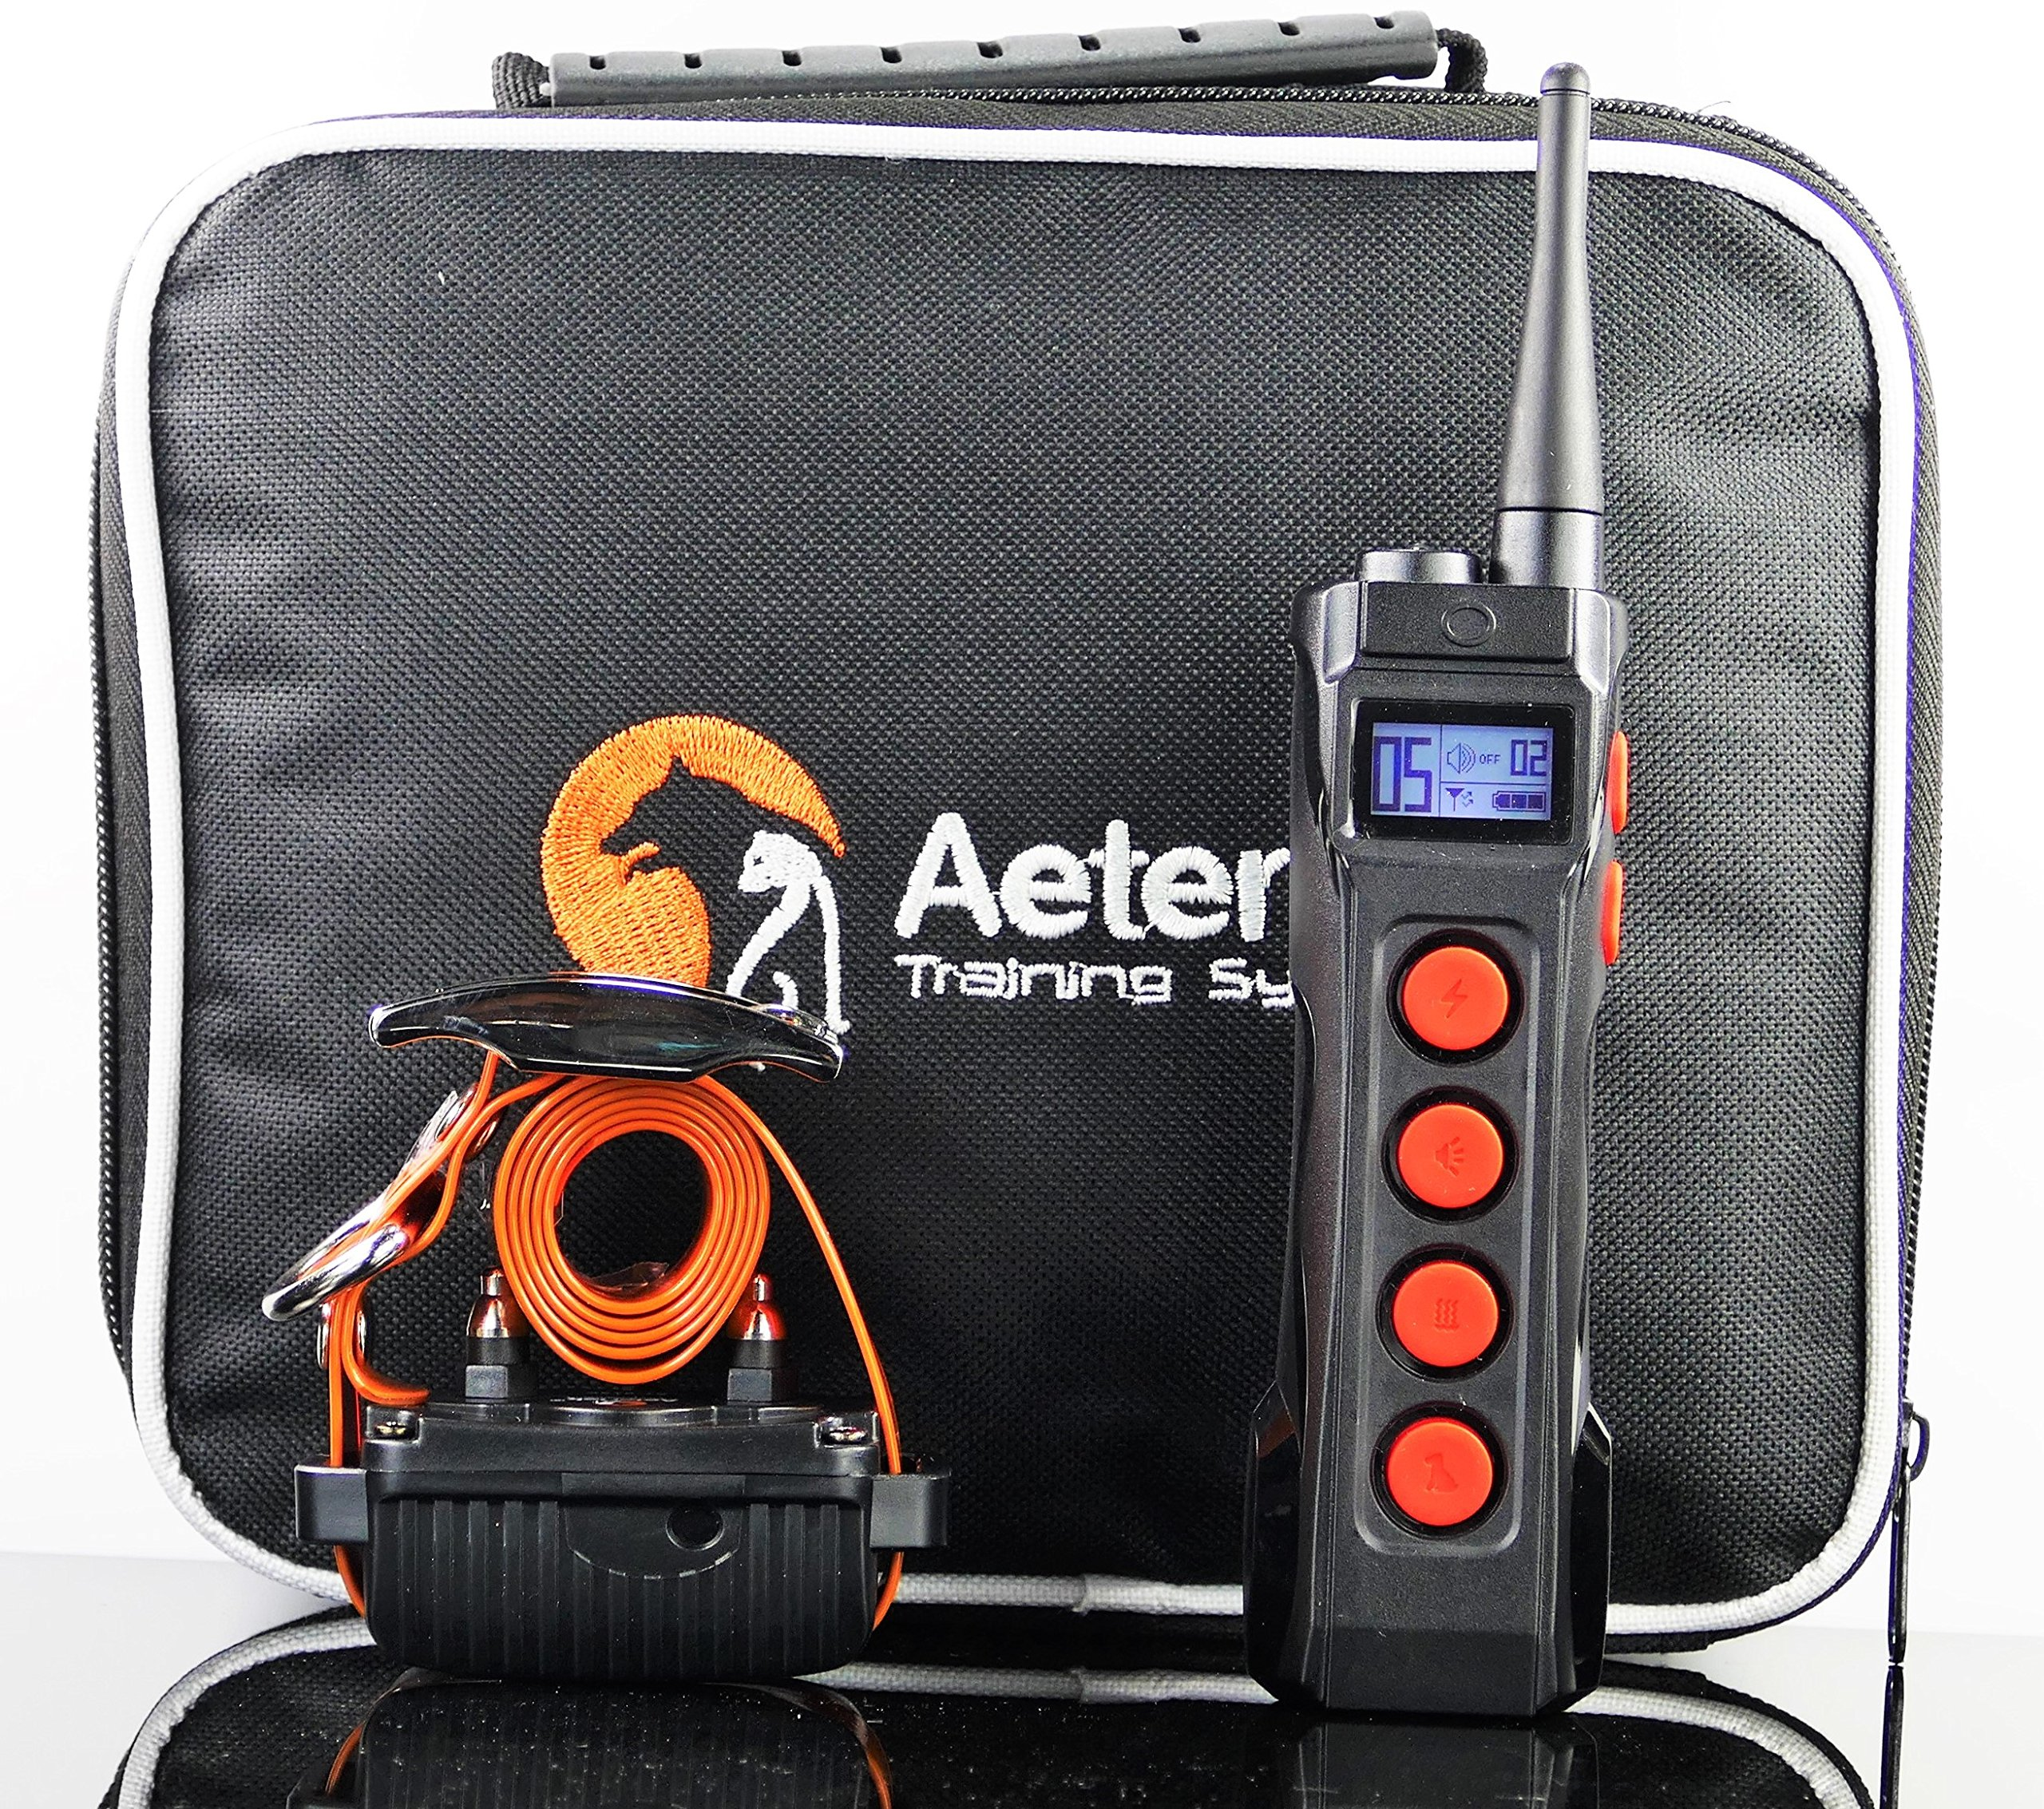 Aetertek AT-919C 1100 Yard Ultra Range Remote Training Shock Collar with AUTO Anti-BARK,Rechargeable and Waterproof by Aetertek